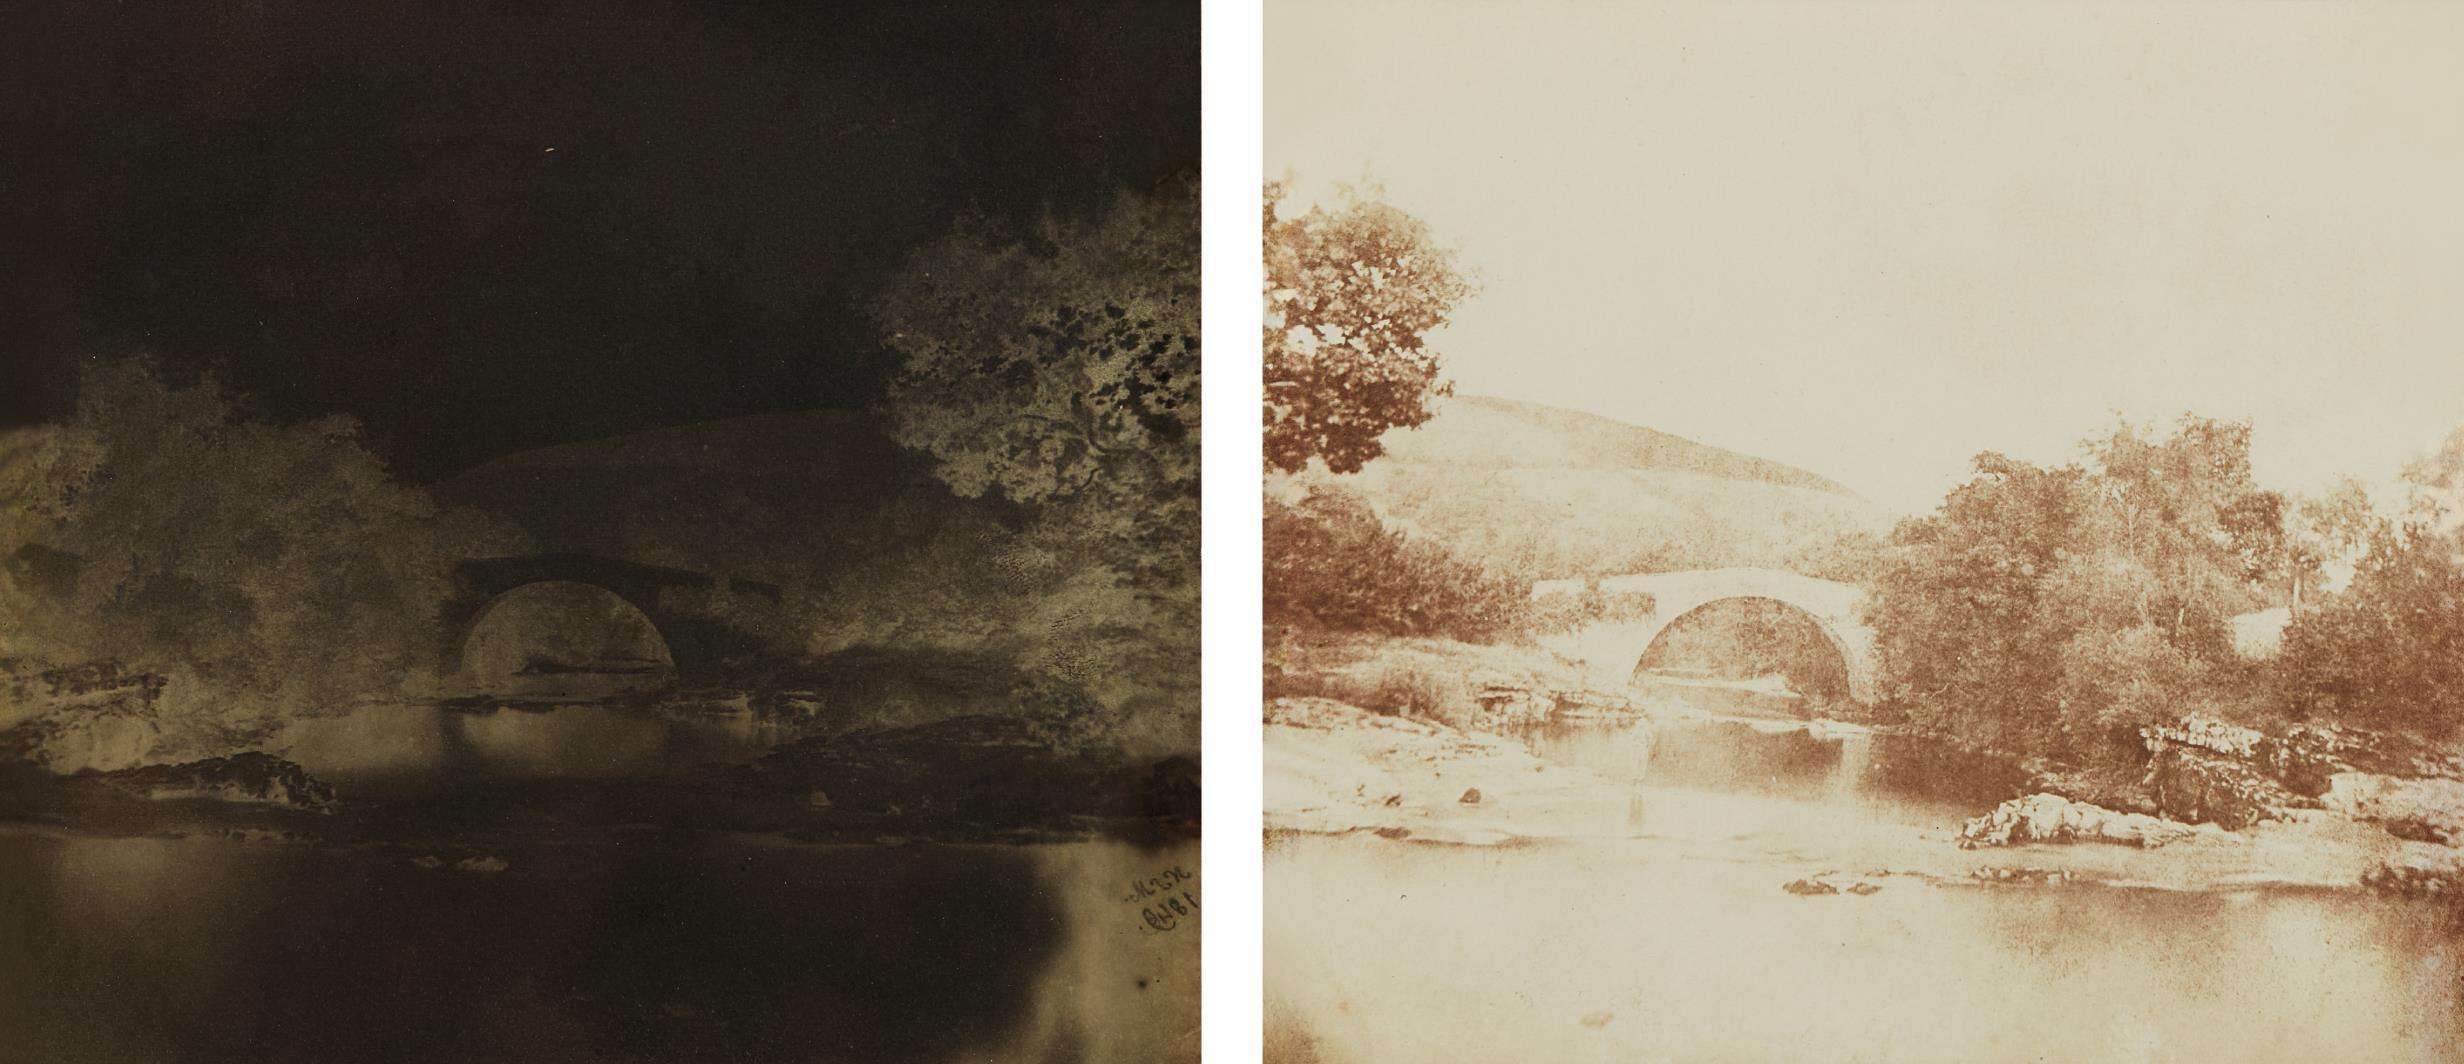 Nevil Story Maskelyne - One-Arch Bridge, Breconshire (negative and positive)-1849